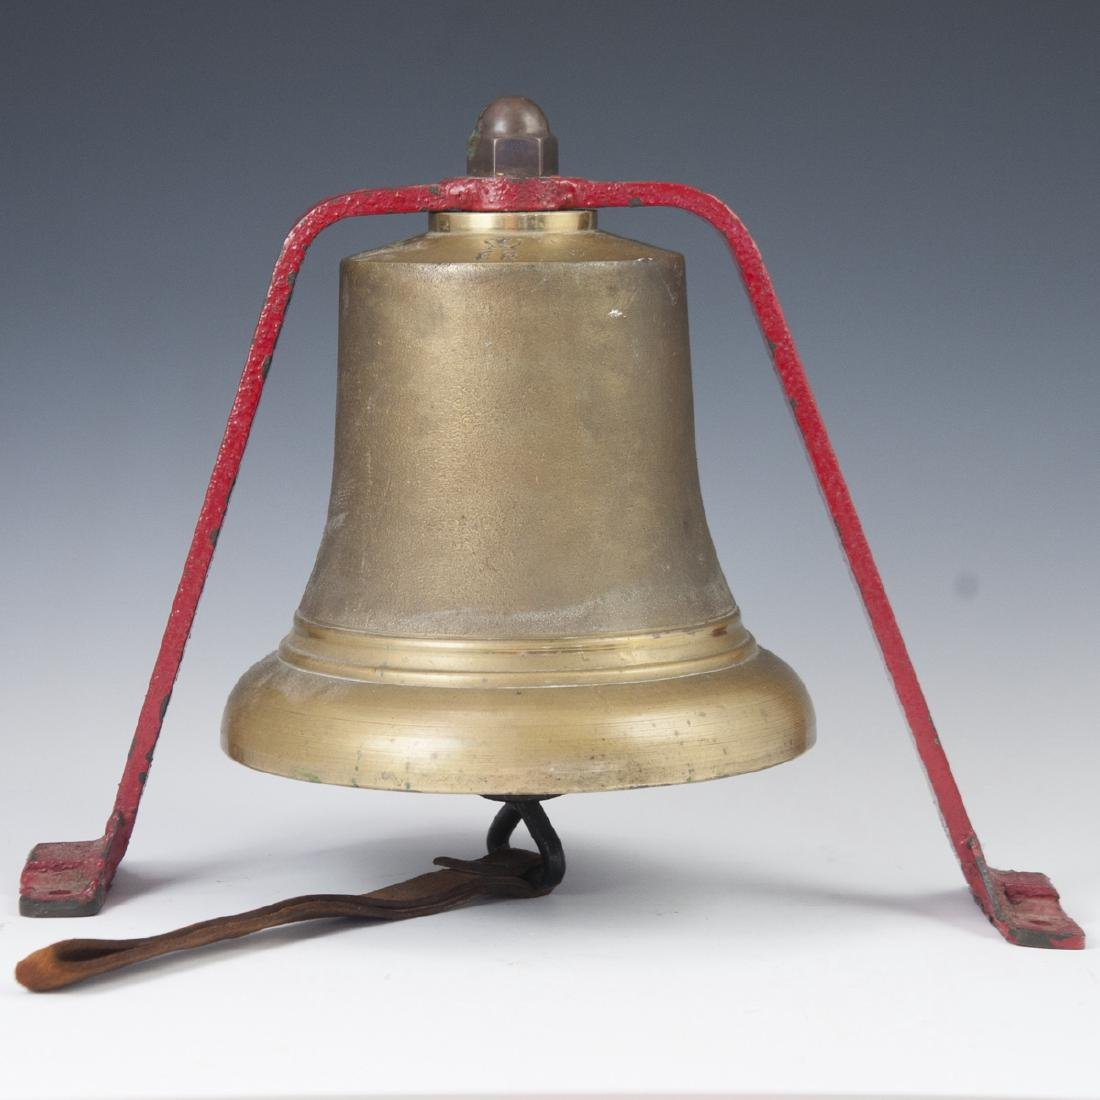 Antique British Quarterdeck Fire Bell